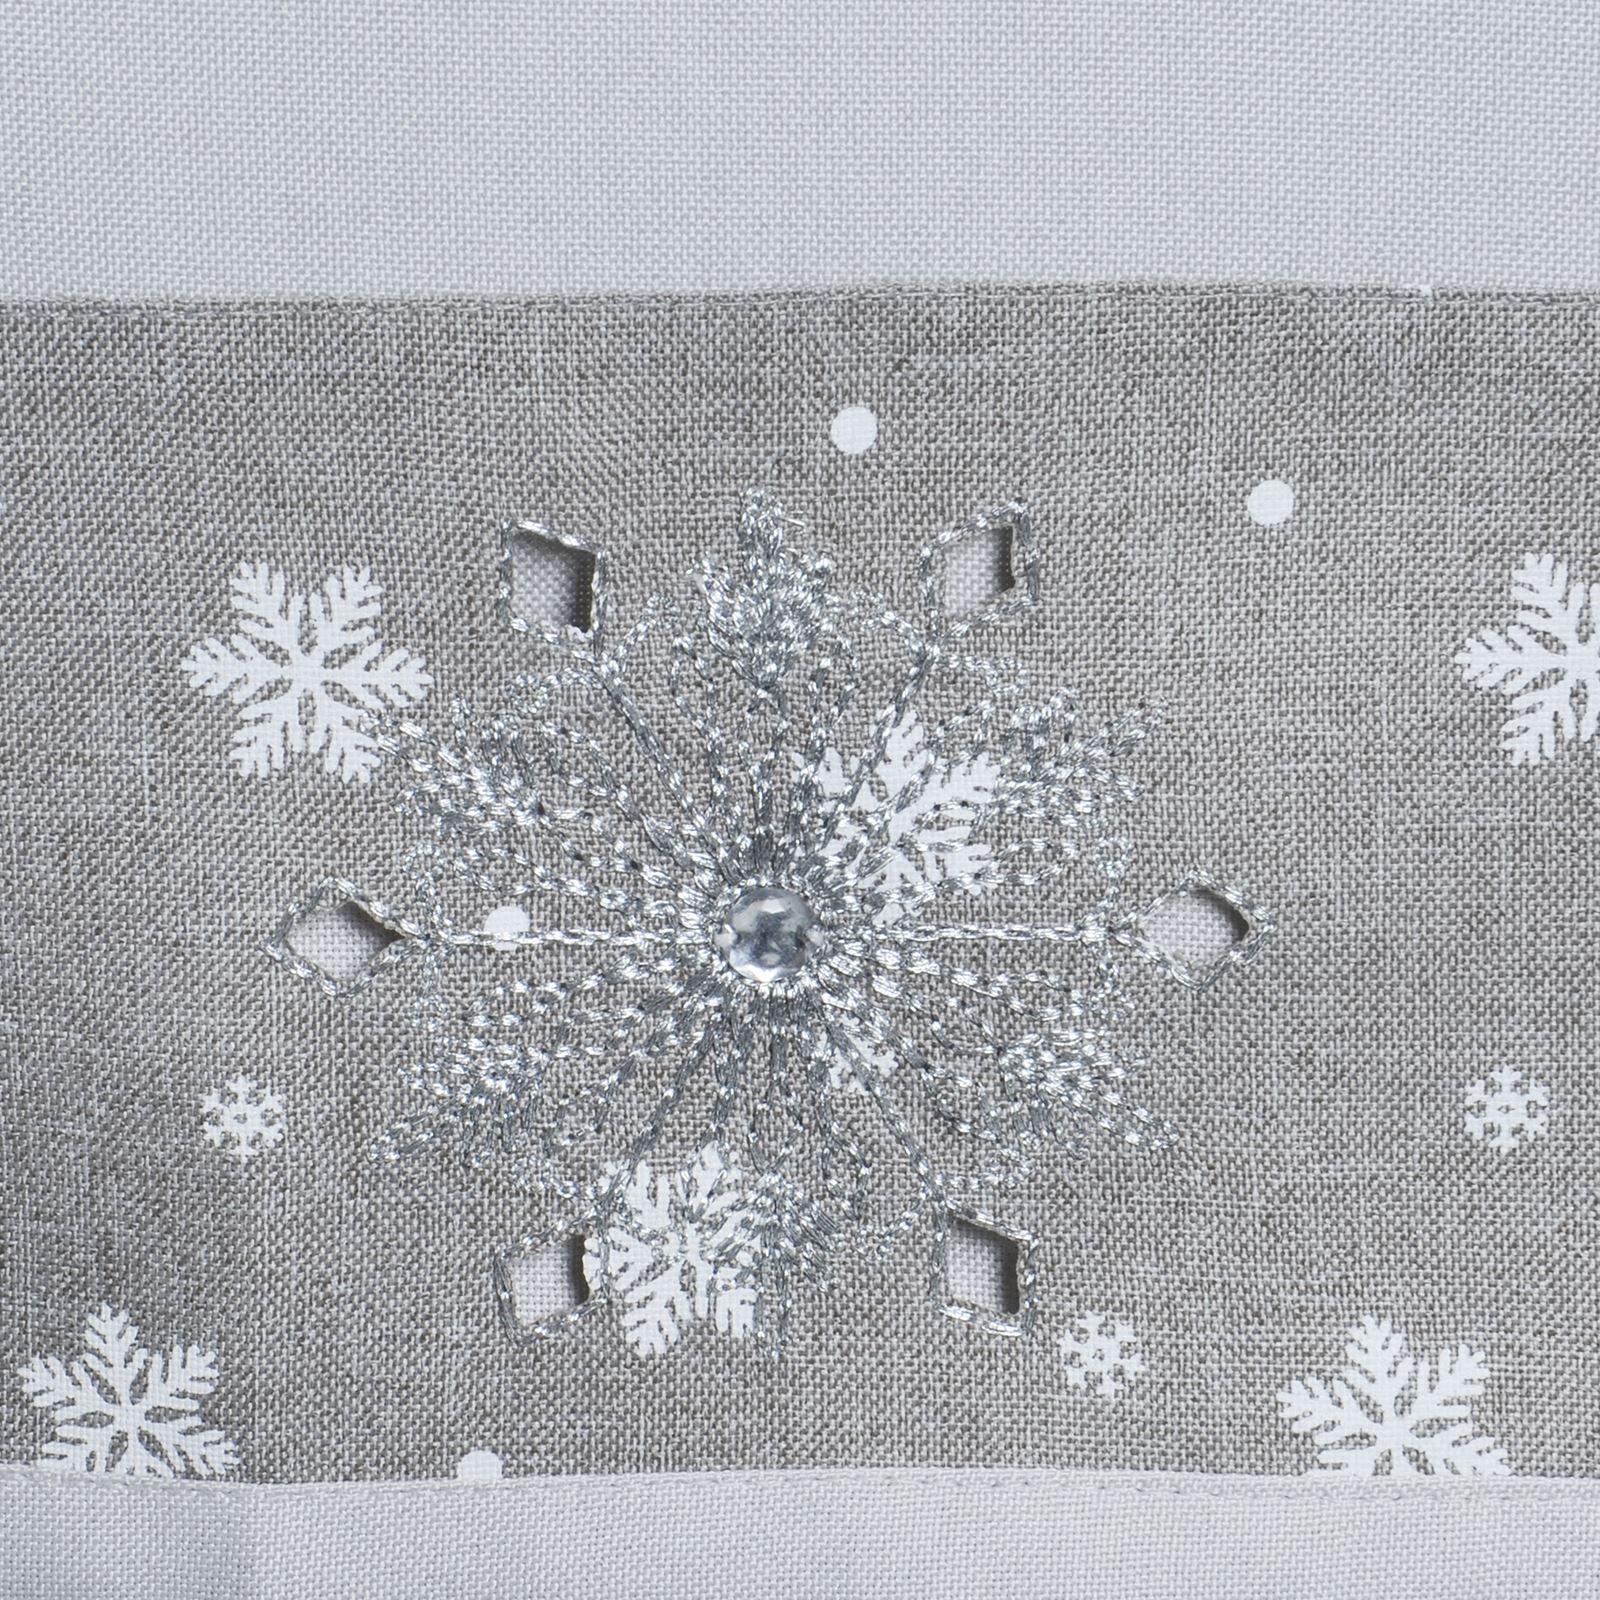 Christmas-Tablecloth-Festive-Pattern-Rectangle-Round-Fabric-Xmas-Room-Decoration Indexbild 67